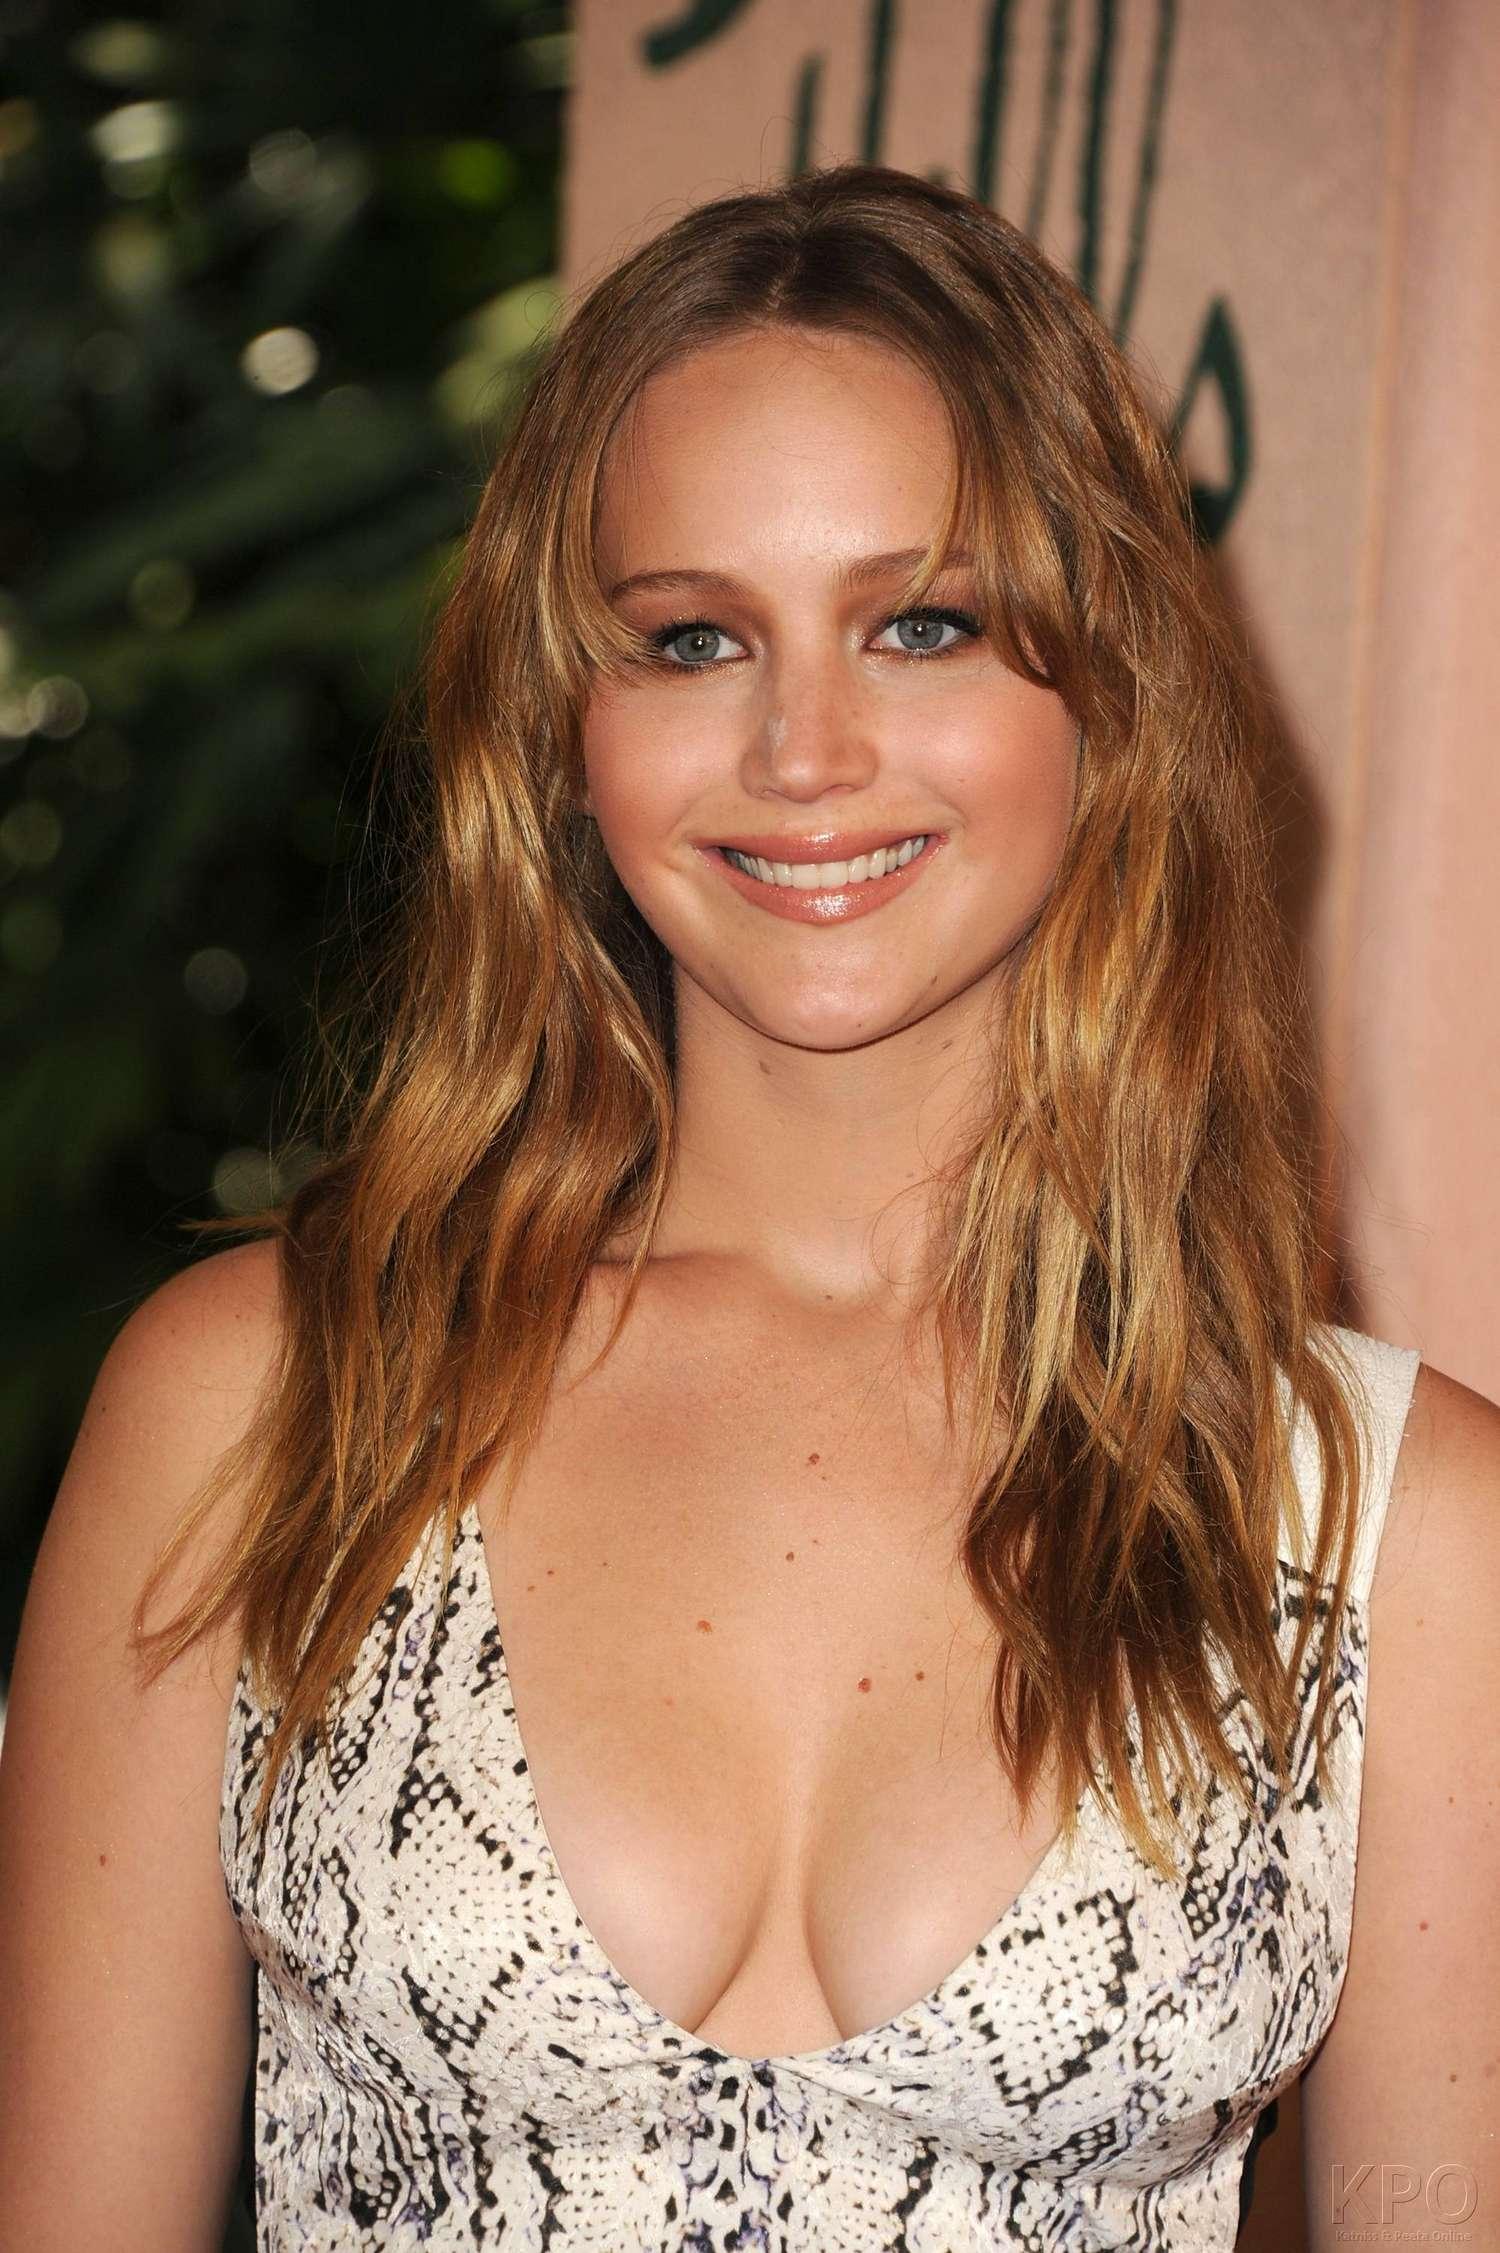 Back To Post Jennifer Lawrence At 2012 Hfpa Installation - Jennifer Lawrence Seksi Hot , HD Wallpaper & Backgrounds